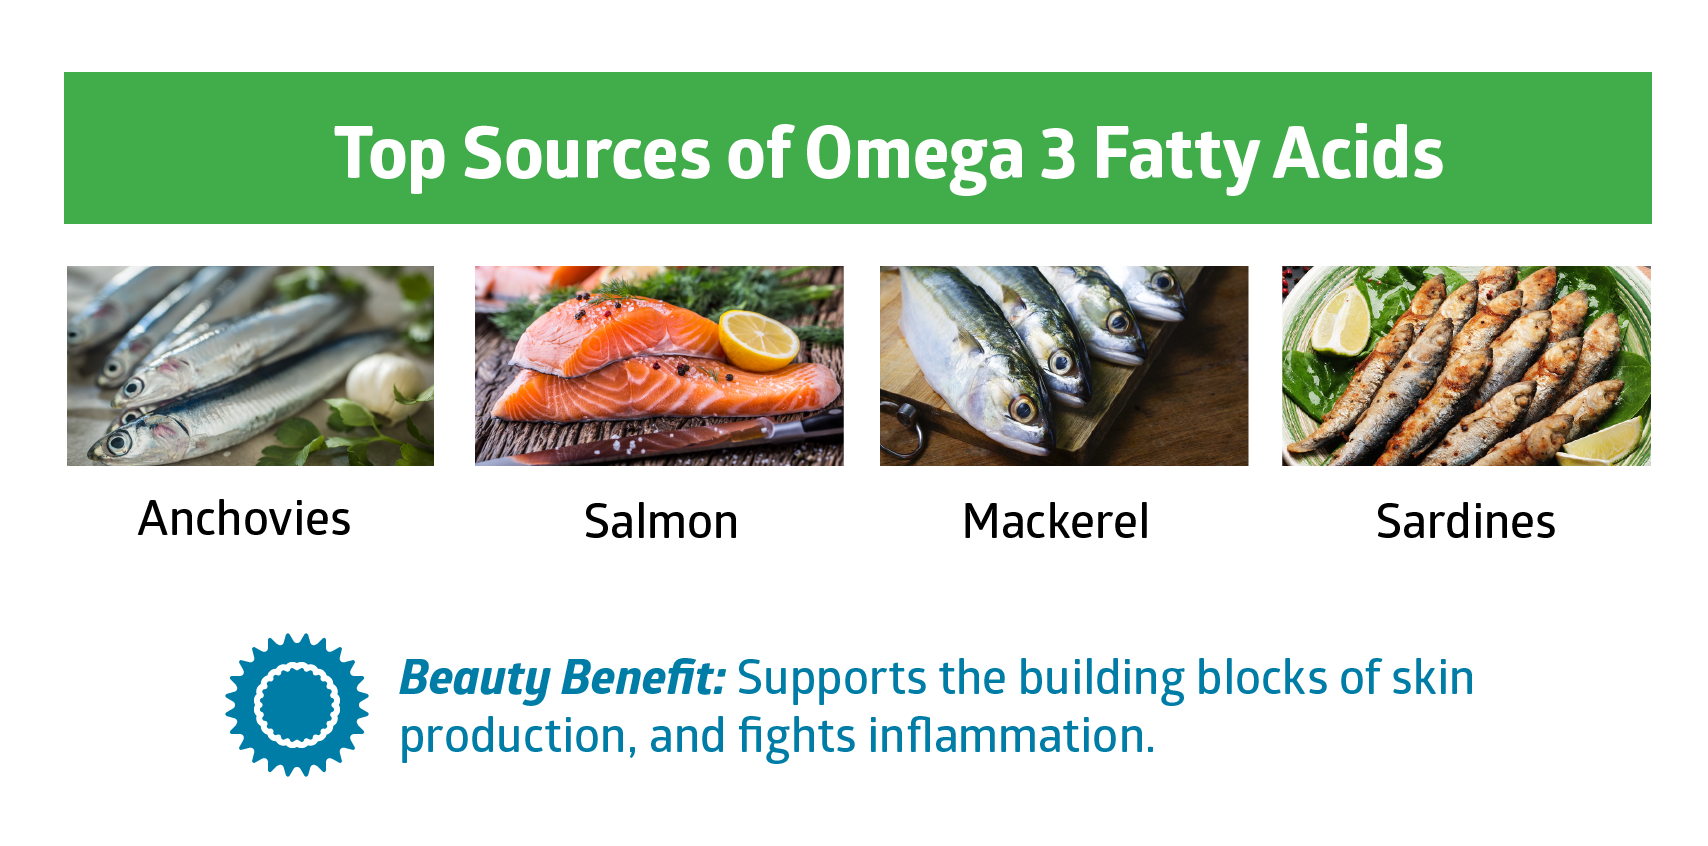 omega 3 fatty acids - beauty vitamins and minerals